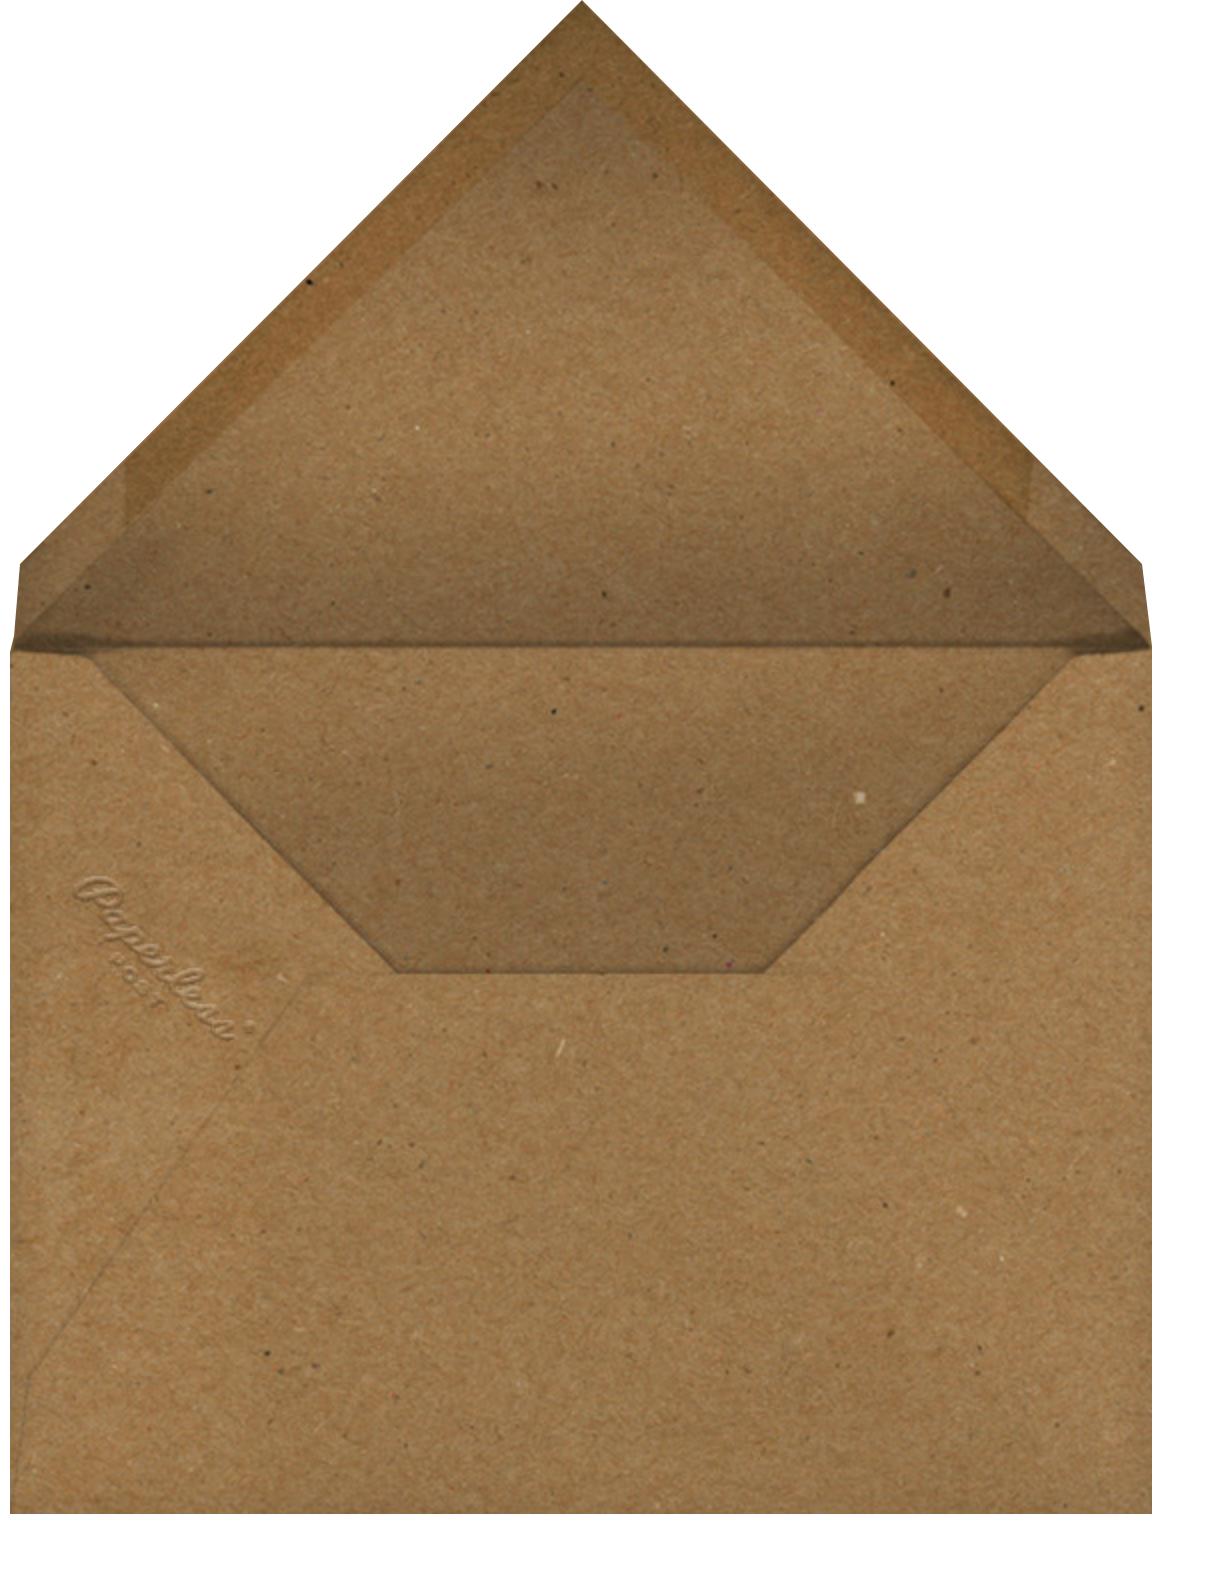 Sawtooth (Square) - Paperless Post - Graduation - envelope back